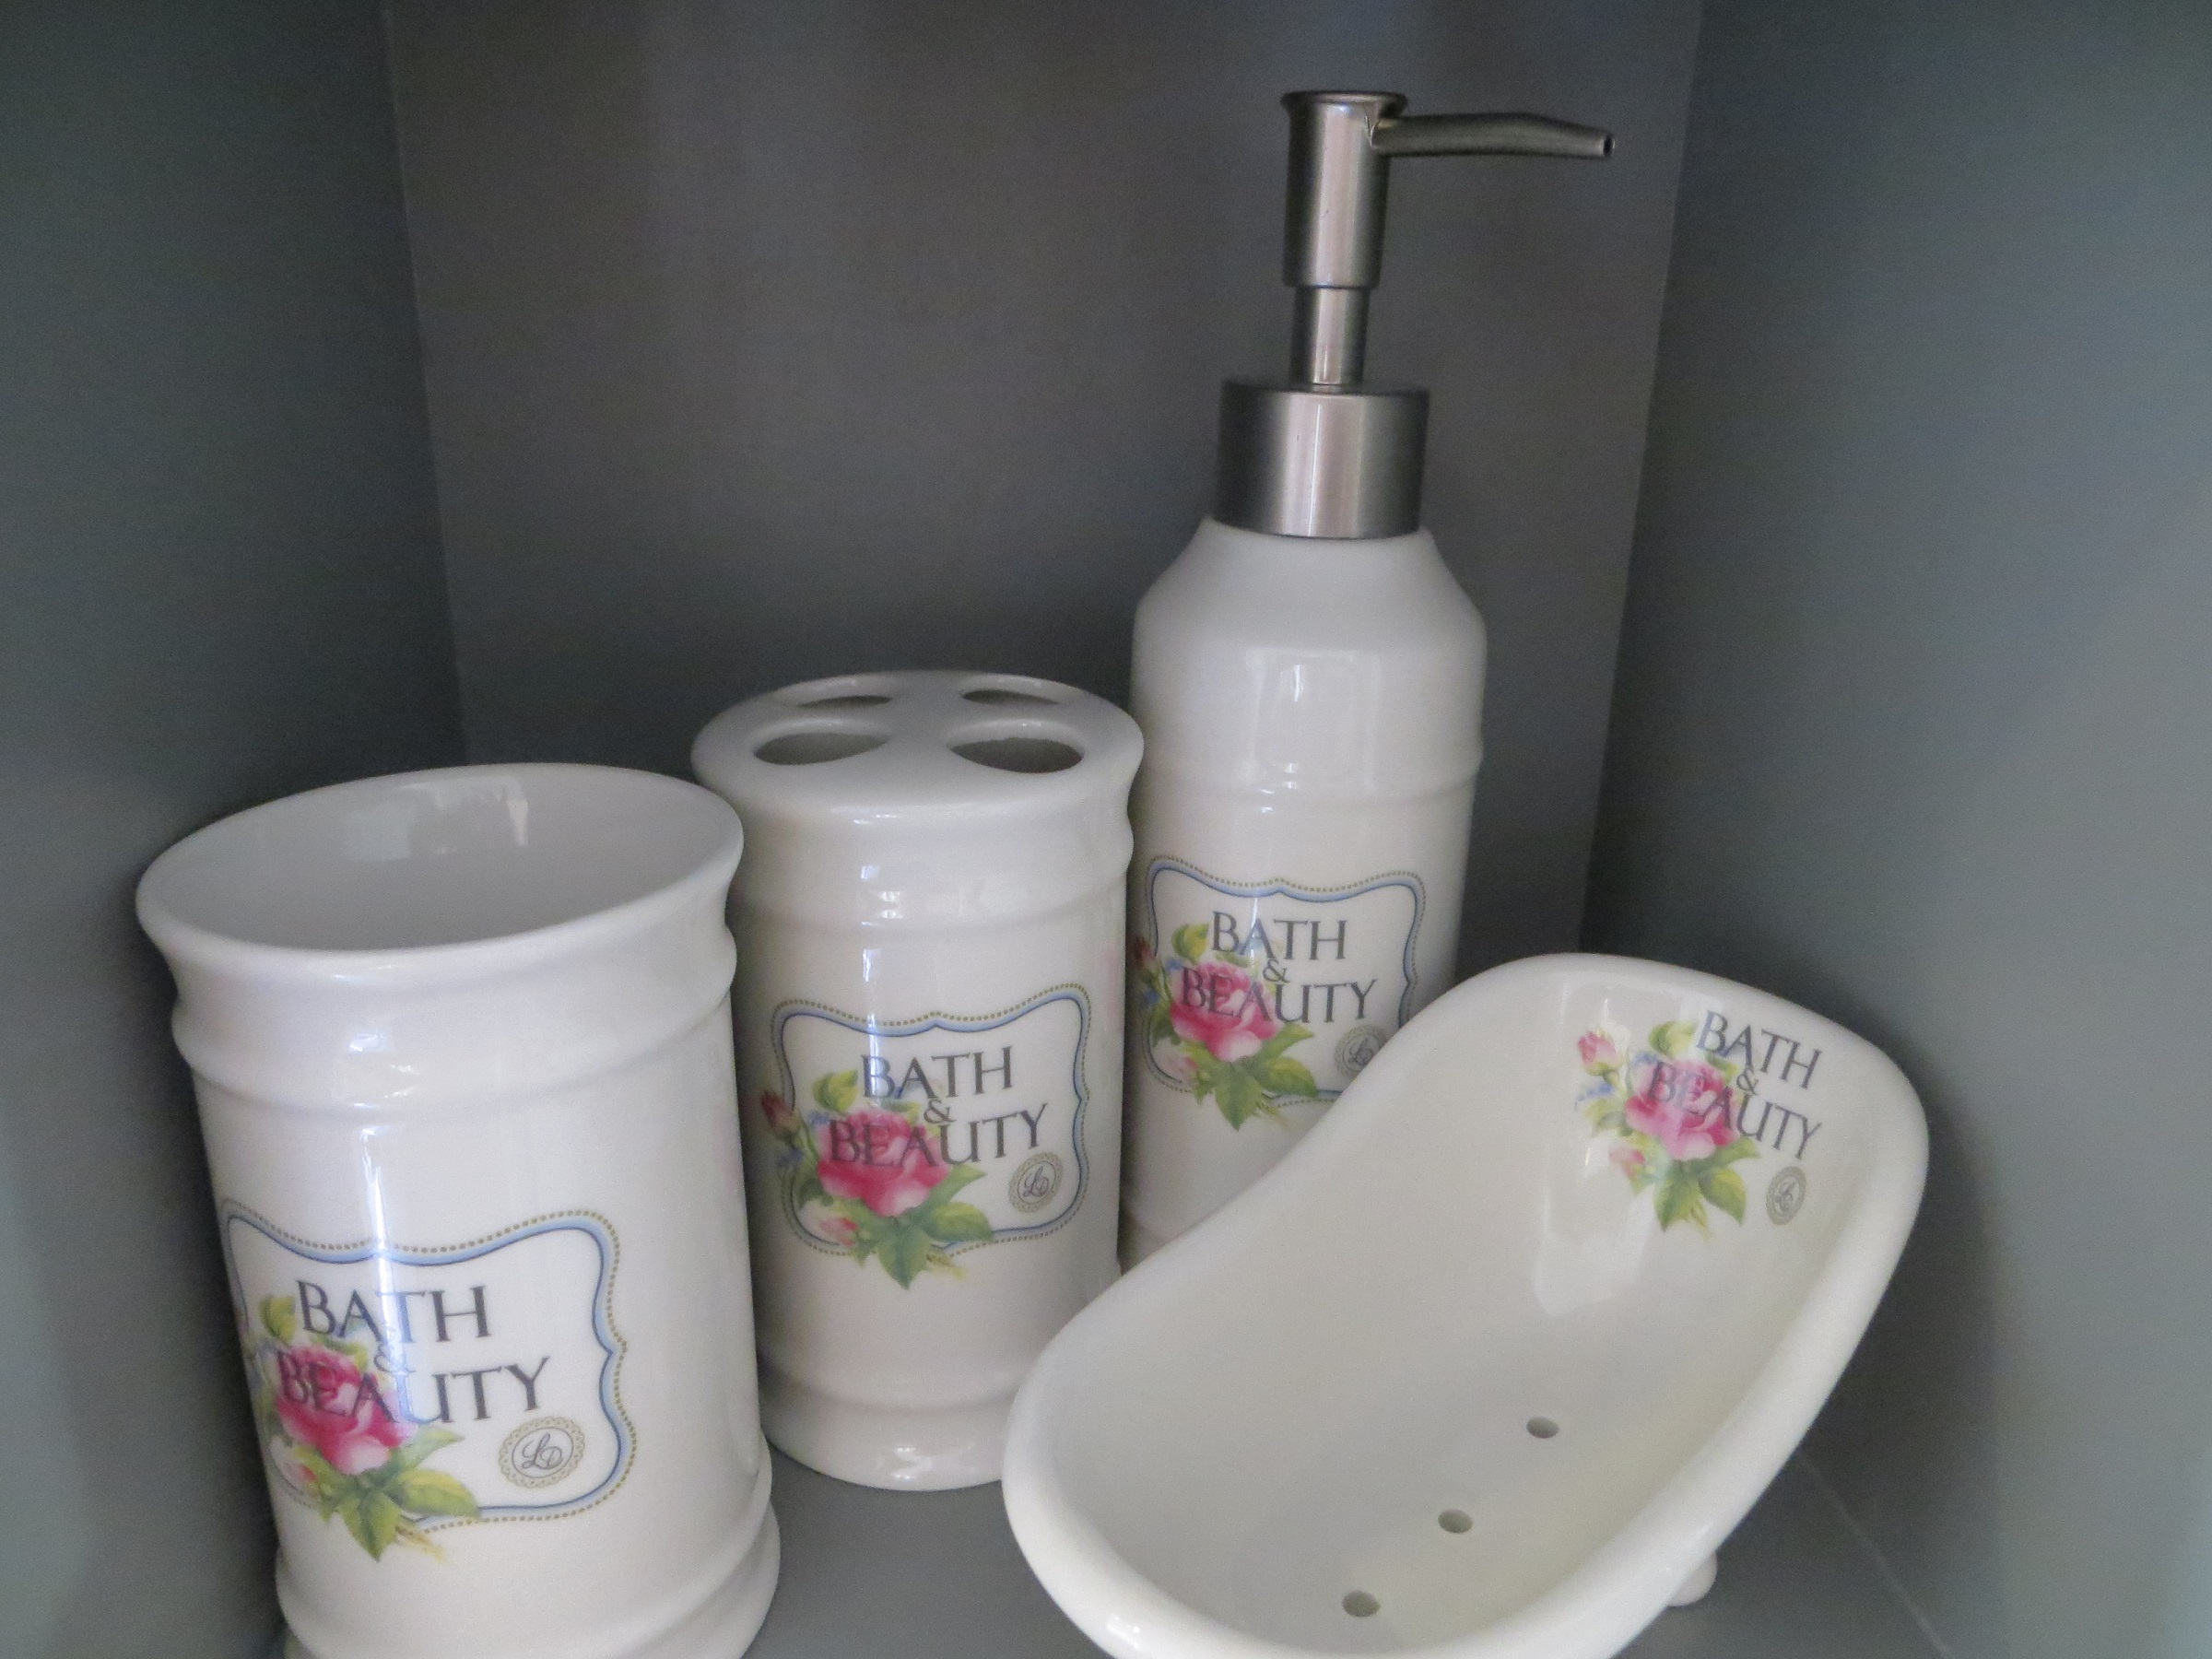 Badezimmerset Bath Beauty Creme mit Rosenmuster Lisbeth Dahl